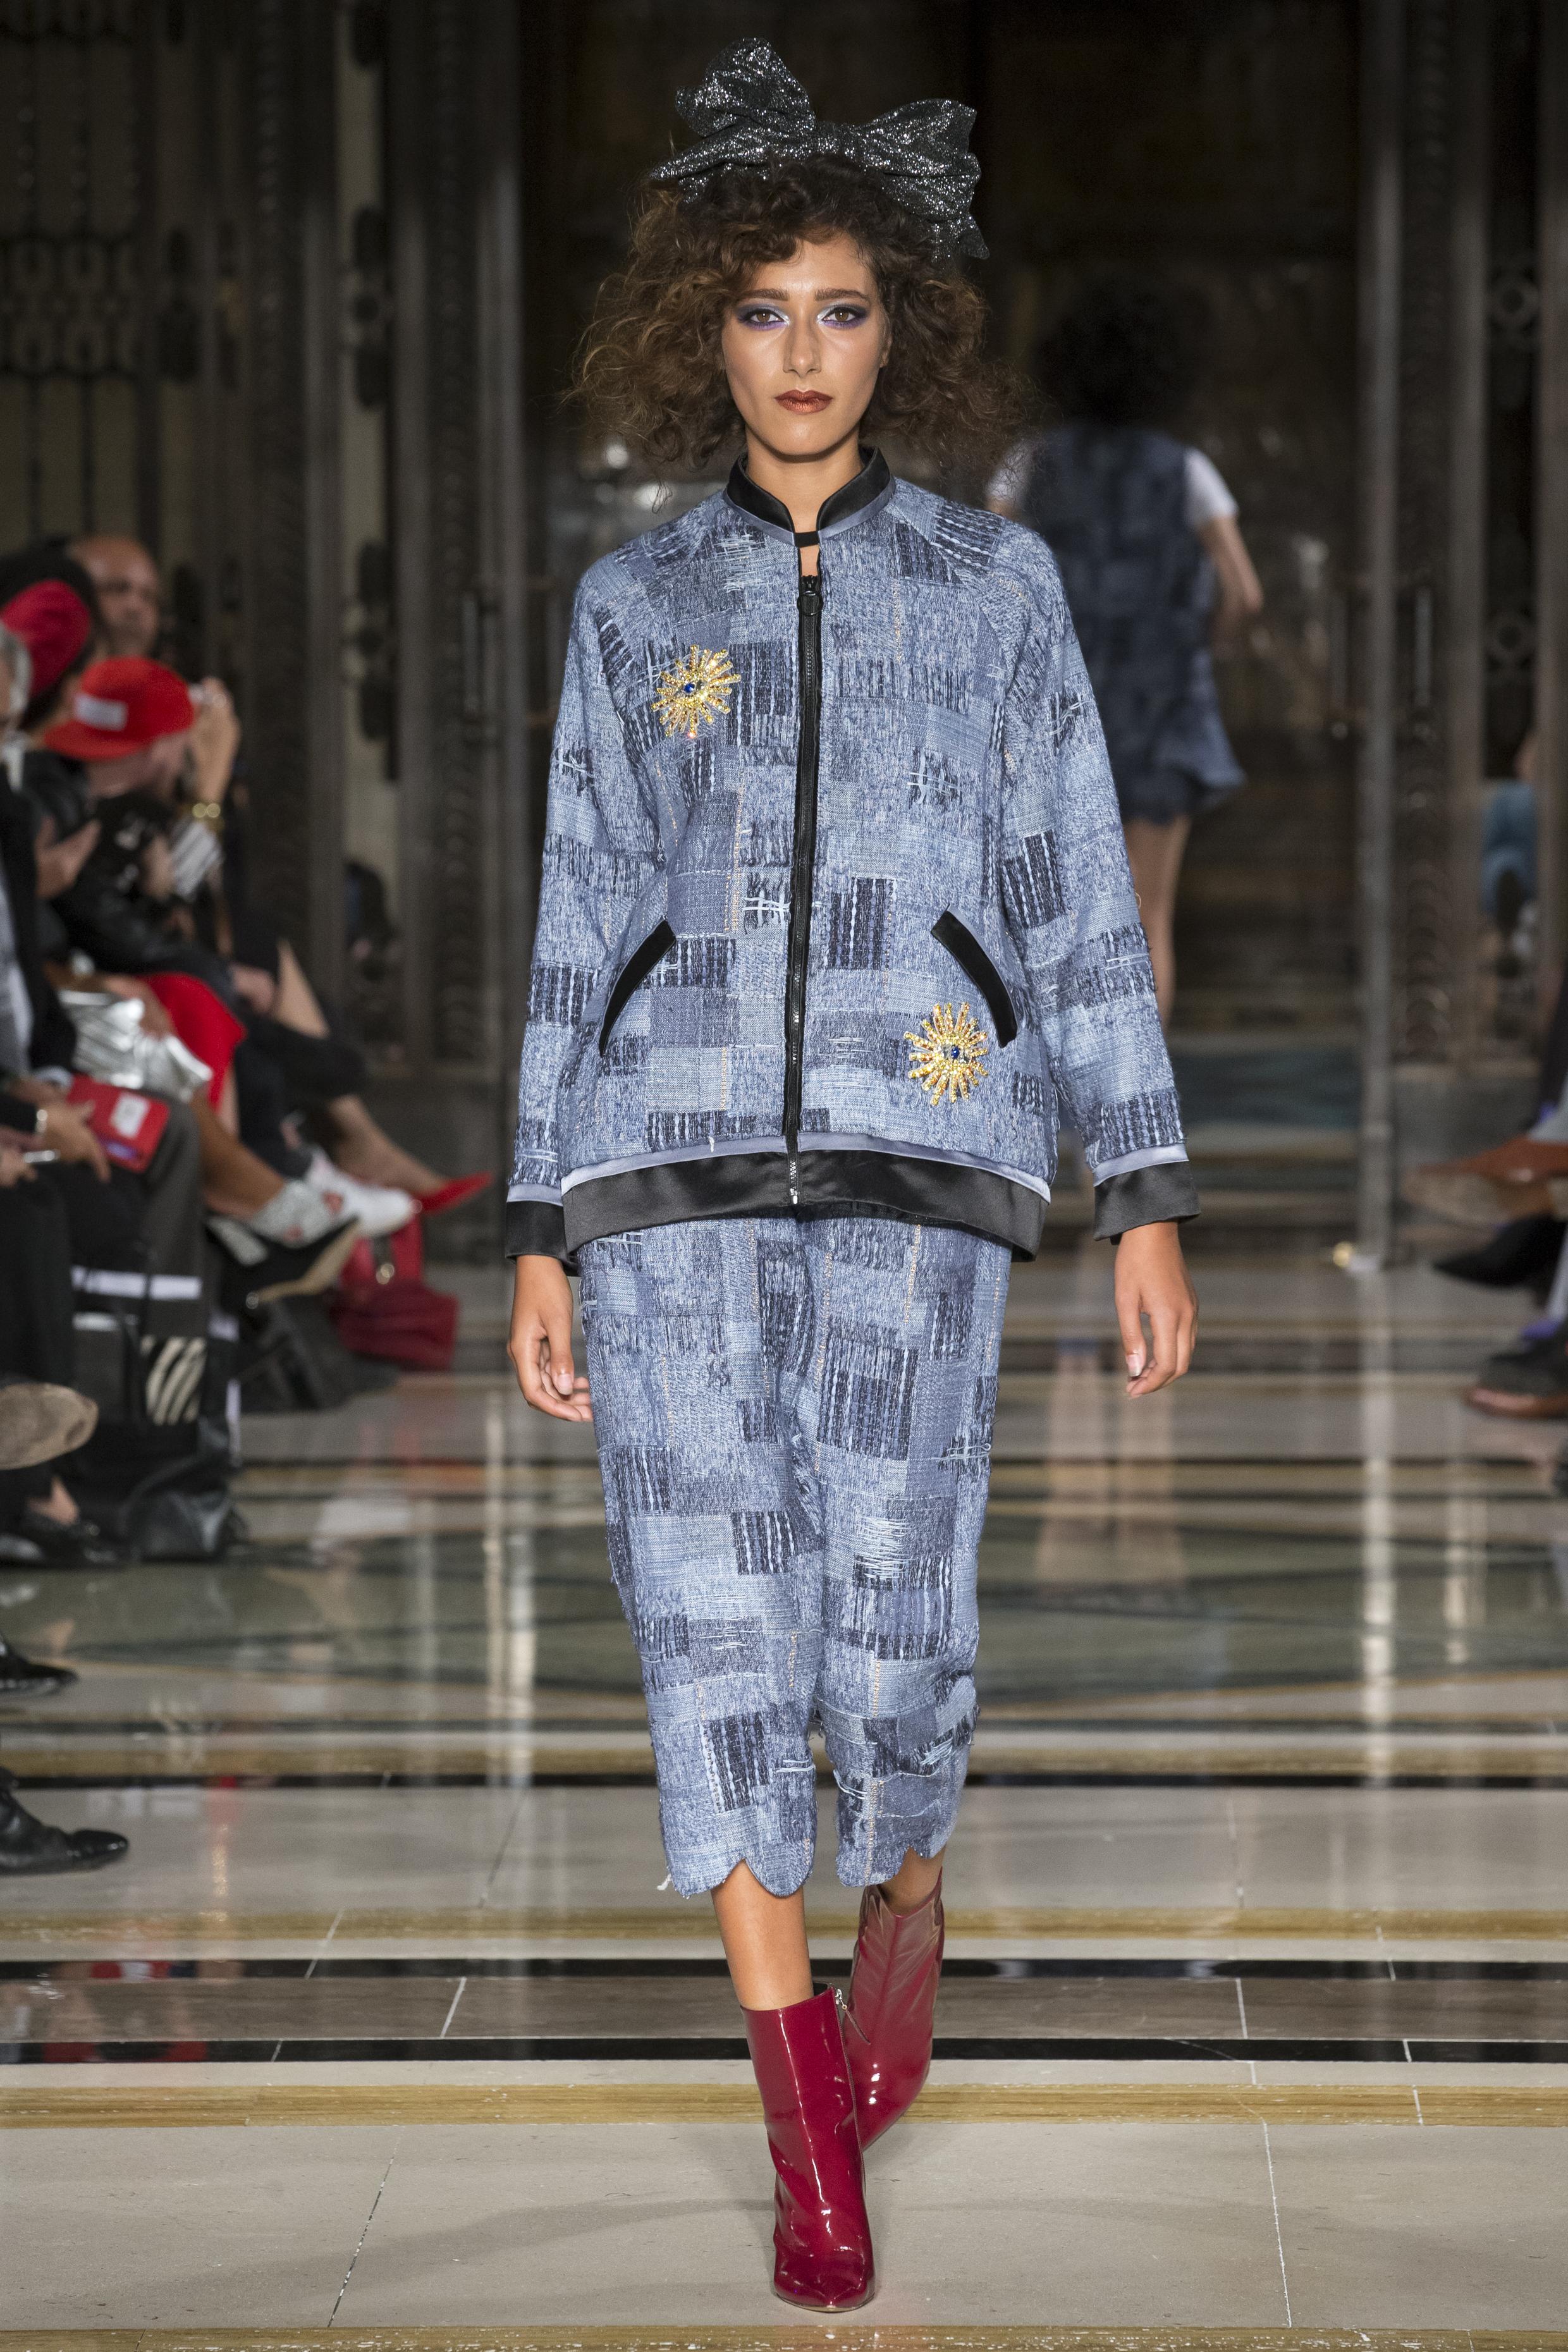 DDFC_X_FAD_Dubai_Fashion_Showcase_SS18_300dpi_011.JPG